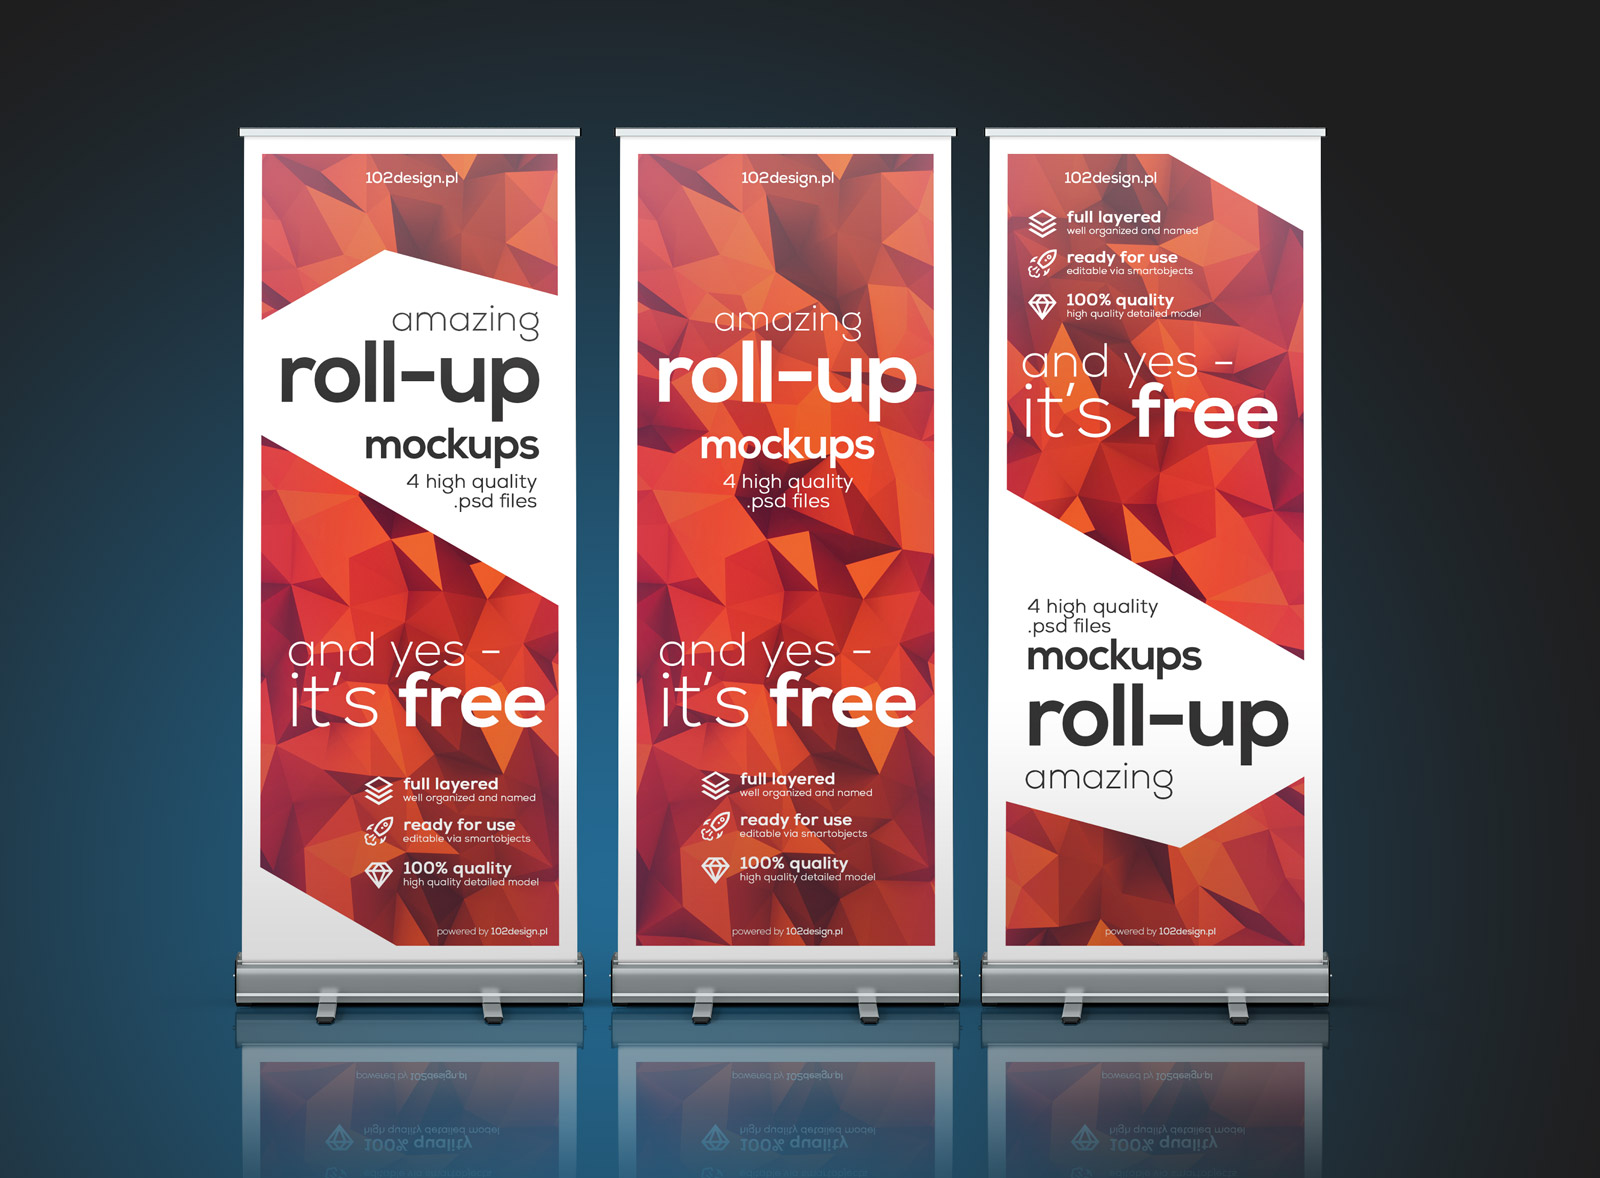 Free-Premuim-Roll-up-Banner-Stand-Mockup-PSD-3